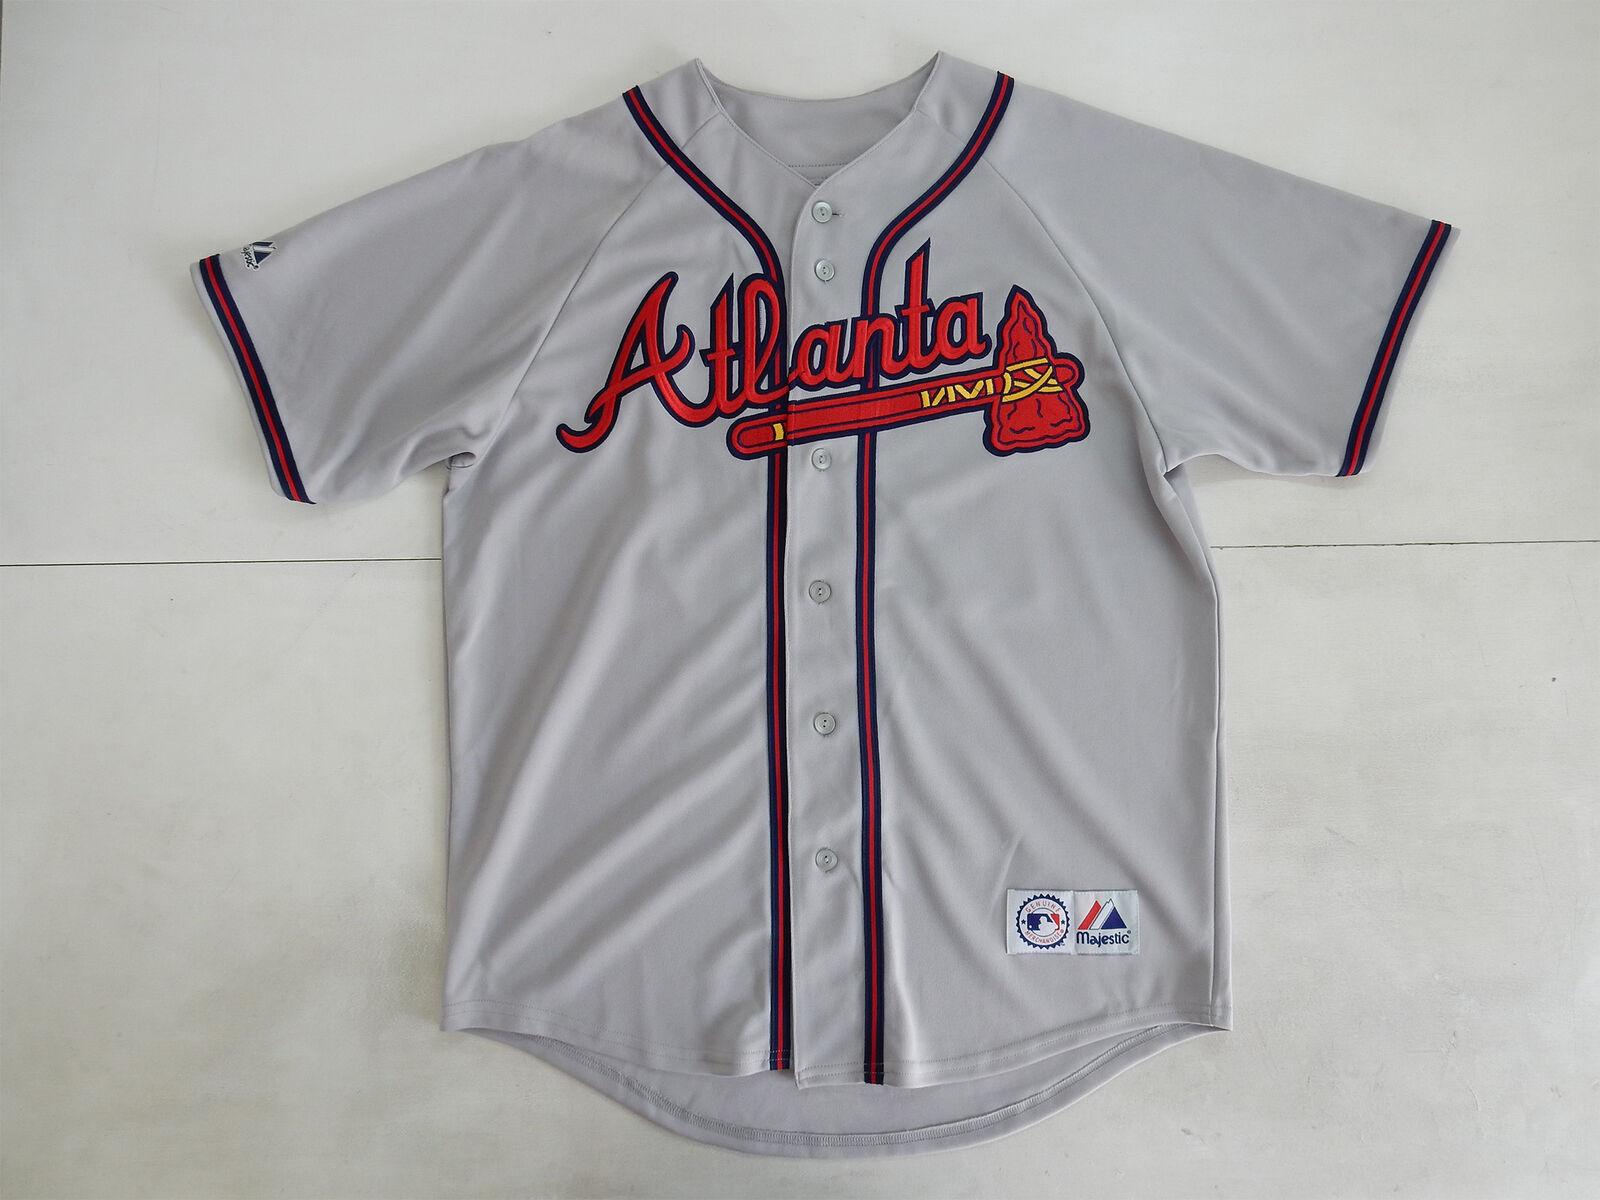 ATLANTA BRAVES JONES MAJESTIC MAJESTIC MAJESTIC MAGLIA SHIRT JERSEY MLB BASEBALL e3e955